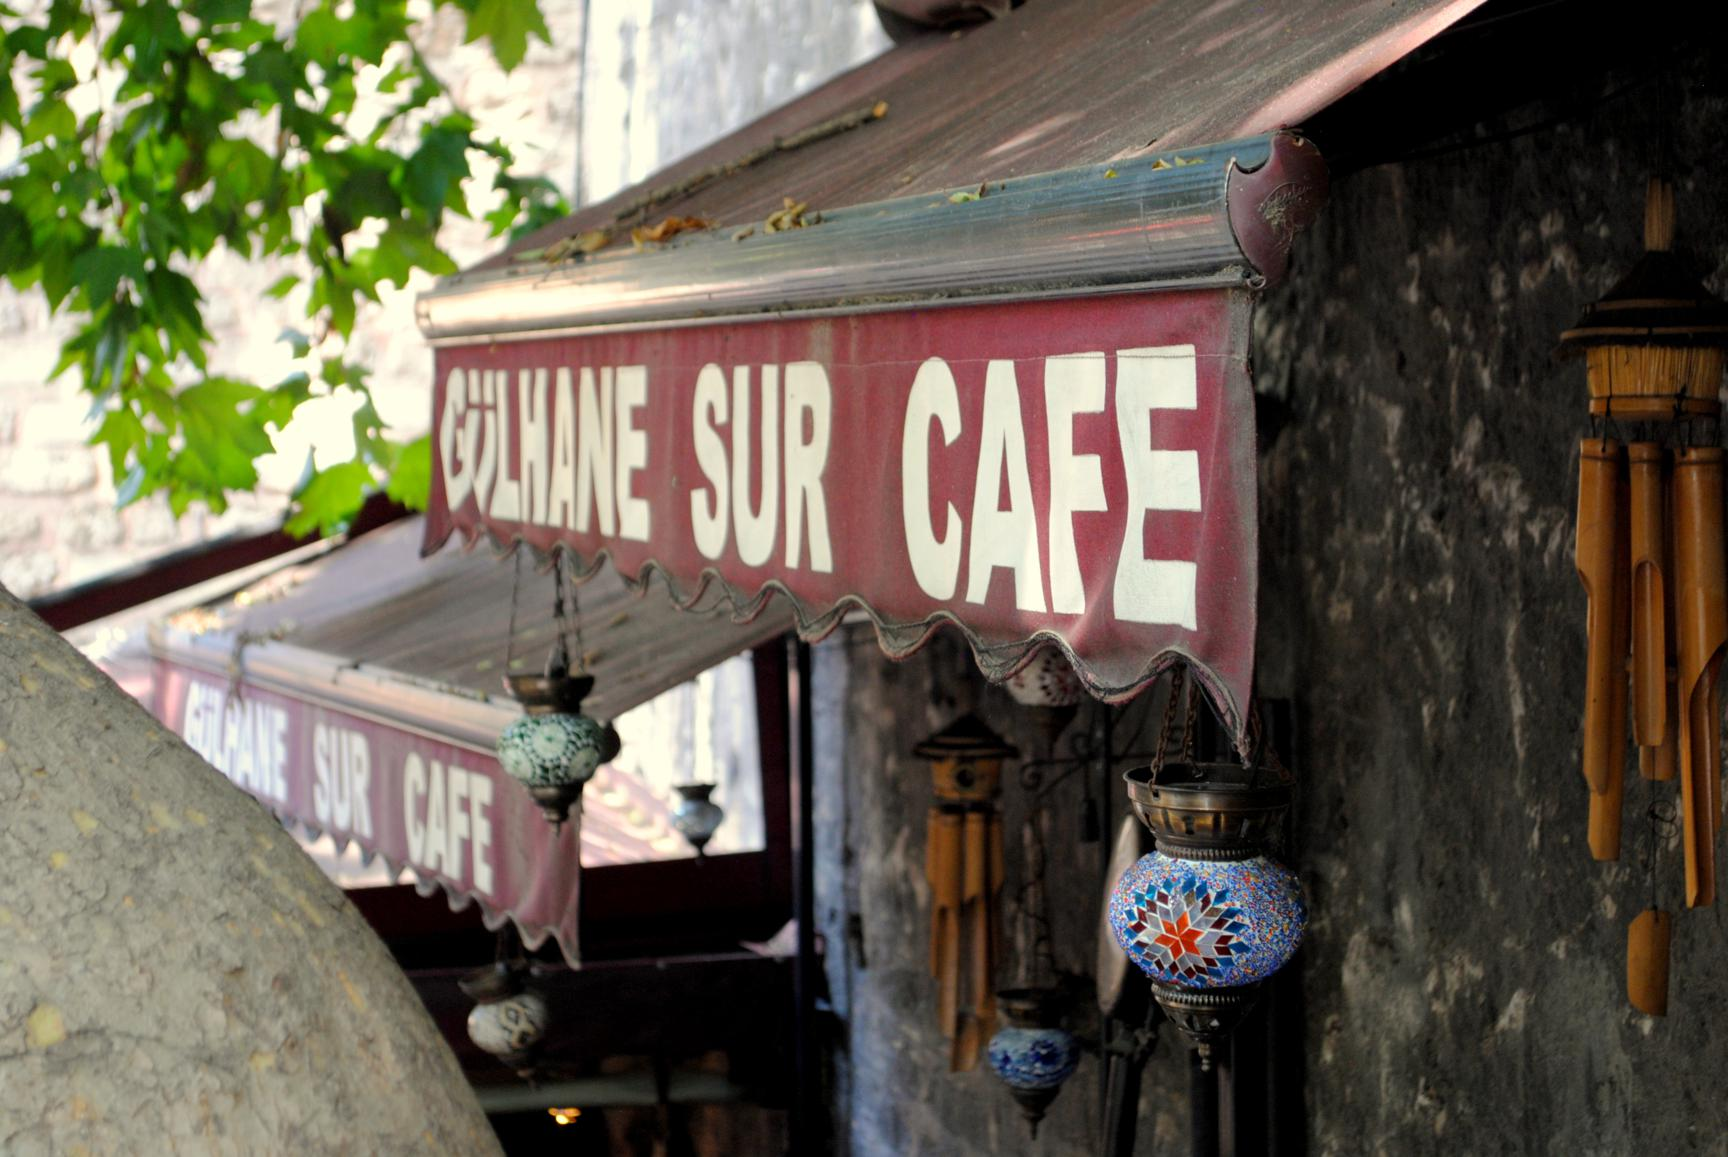 gulhane-sur-cafe-4